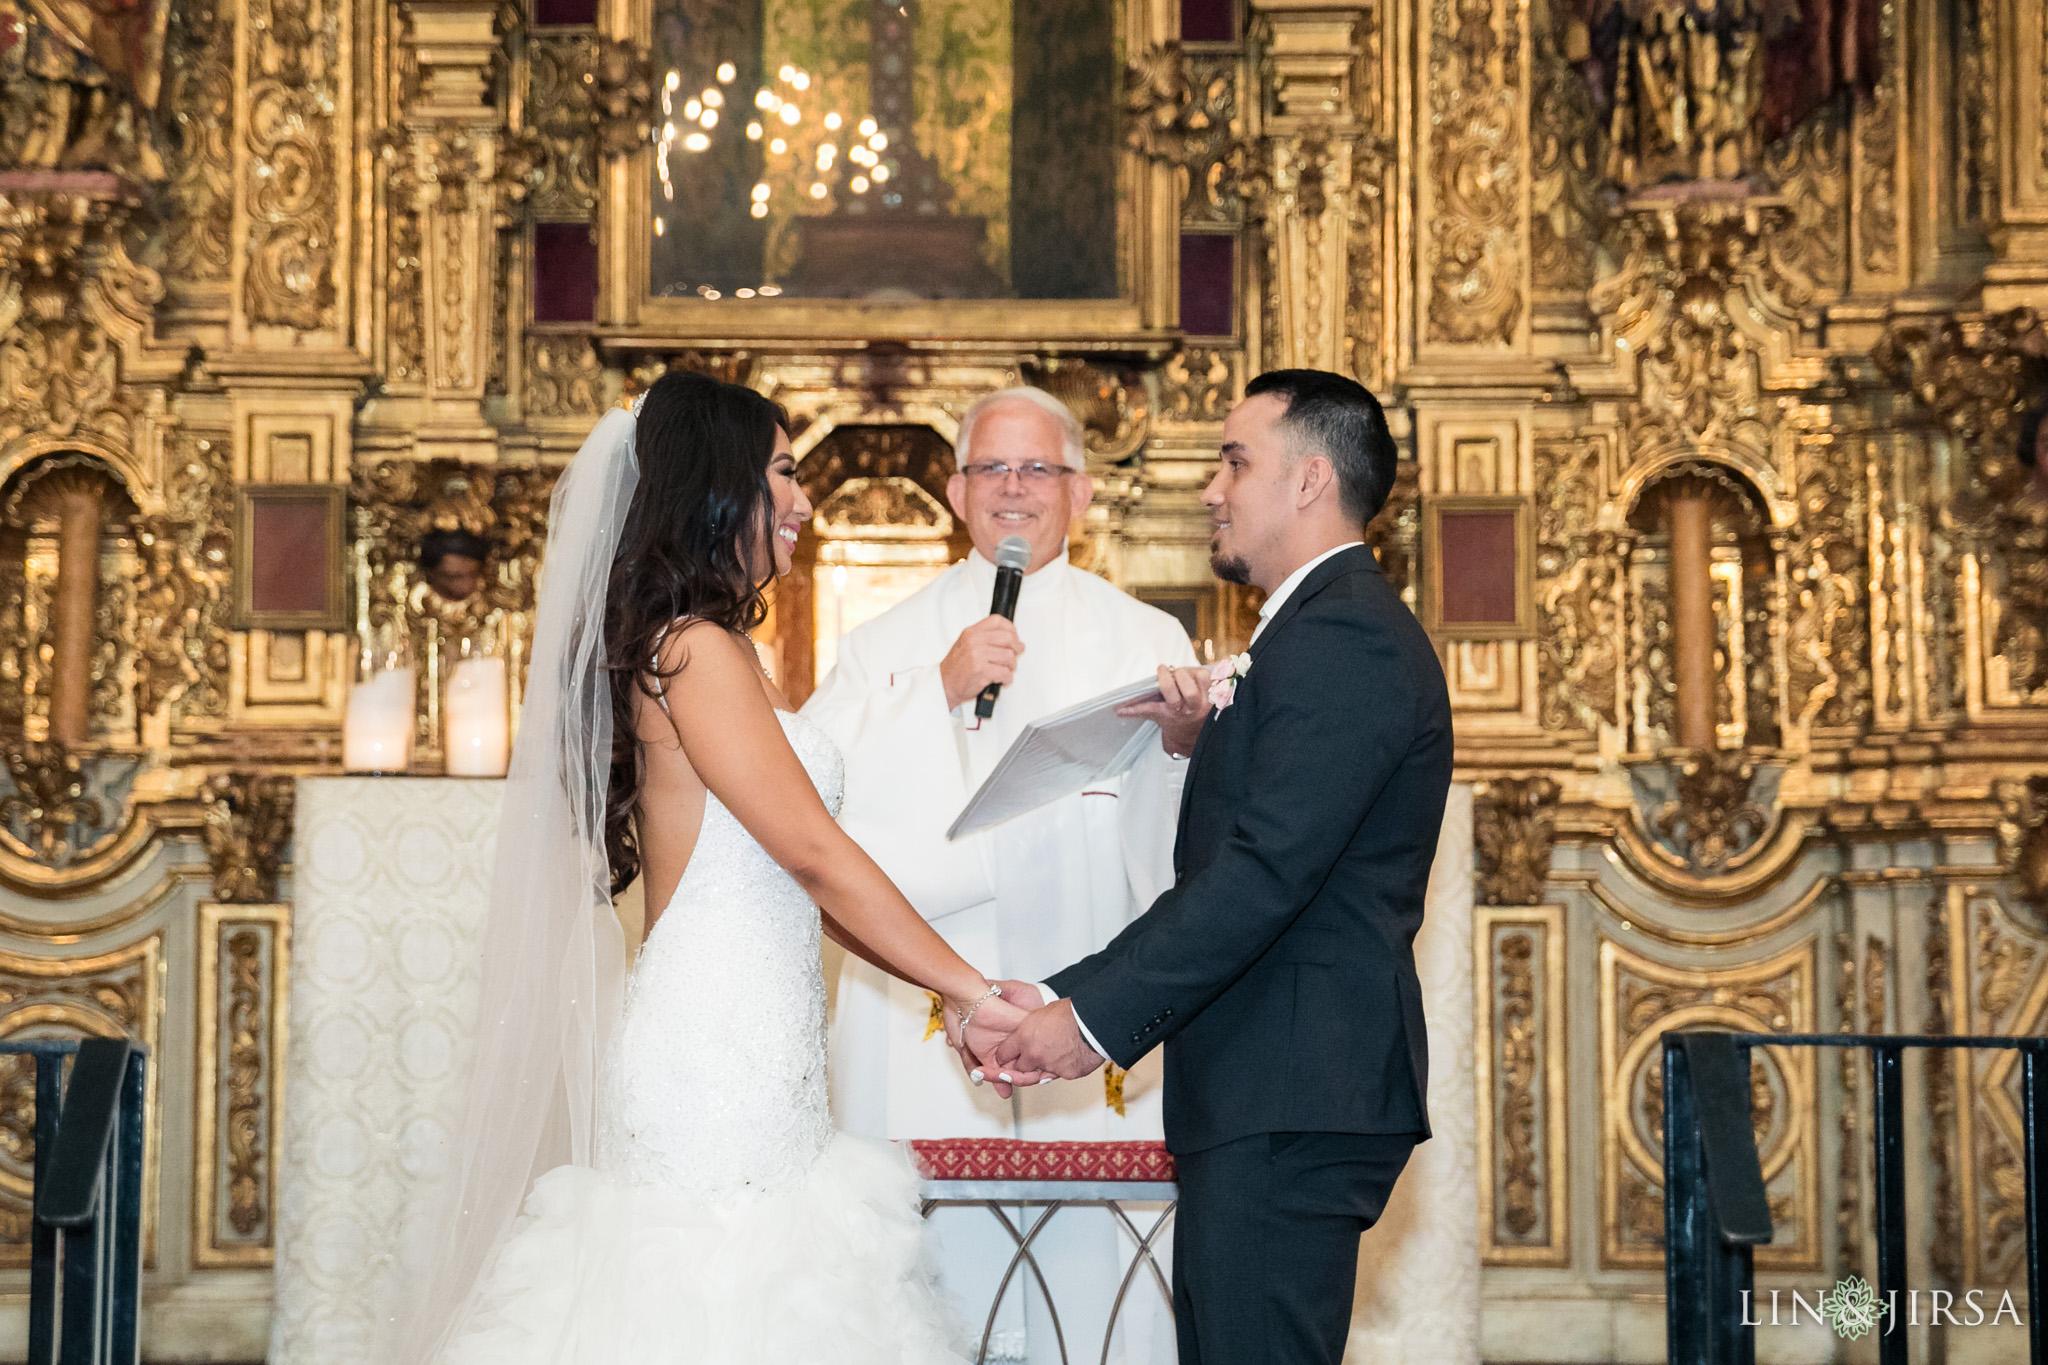 18-mission-inn-riverside-wedding-photography